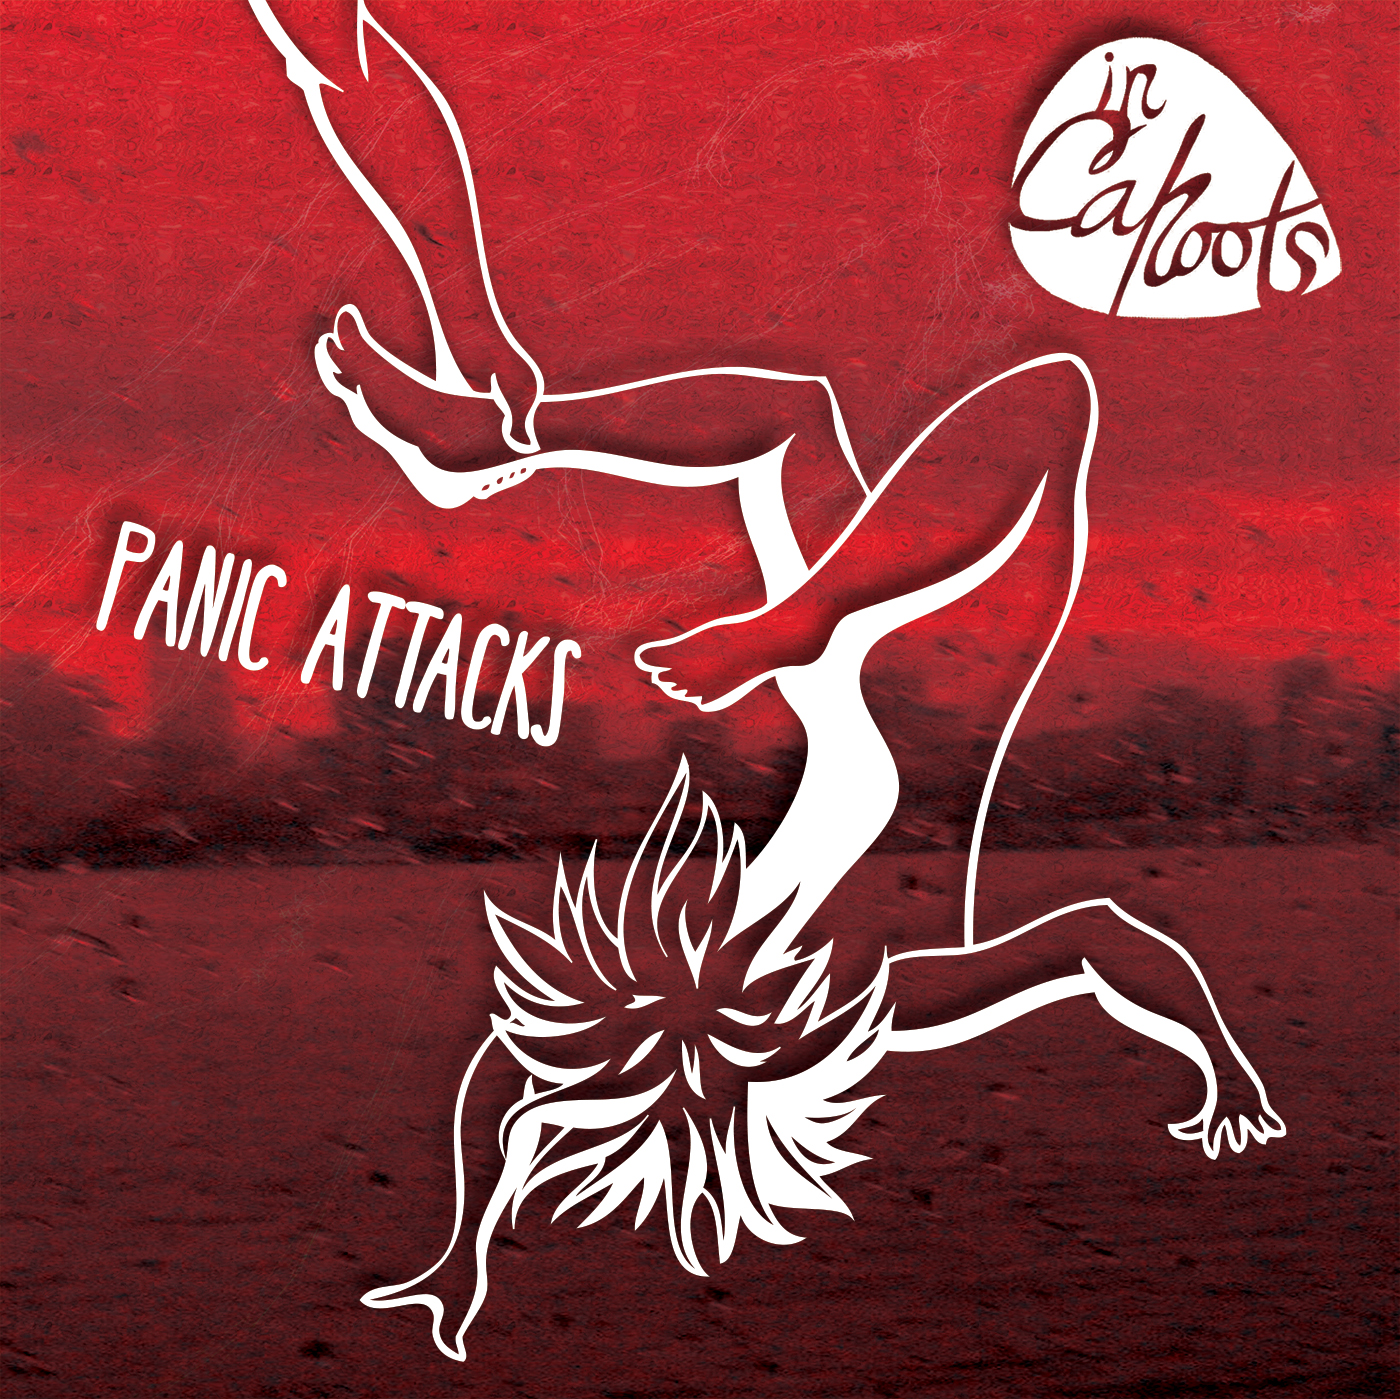 panic-attacks-in-cahoots-cdbaby